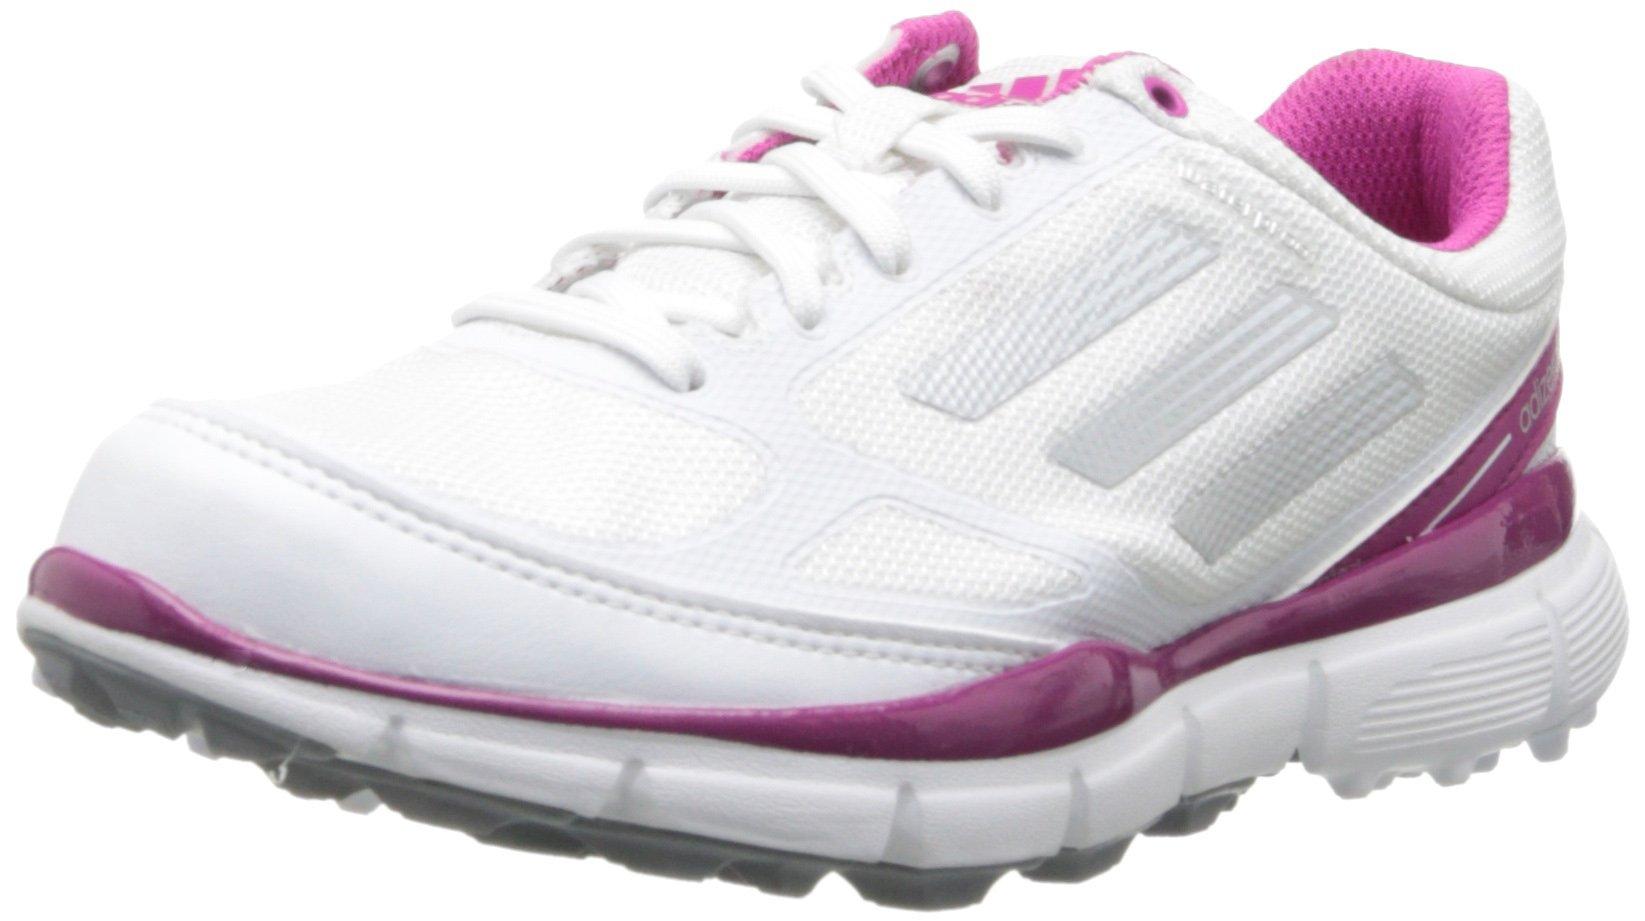 adidas Women's Adizero Sport II Golf Shoe,Running White/Metallic Silver/Bahia Magenta,9 M US